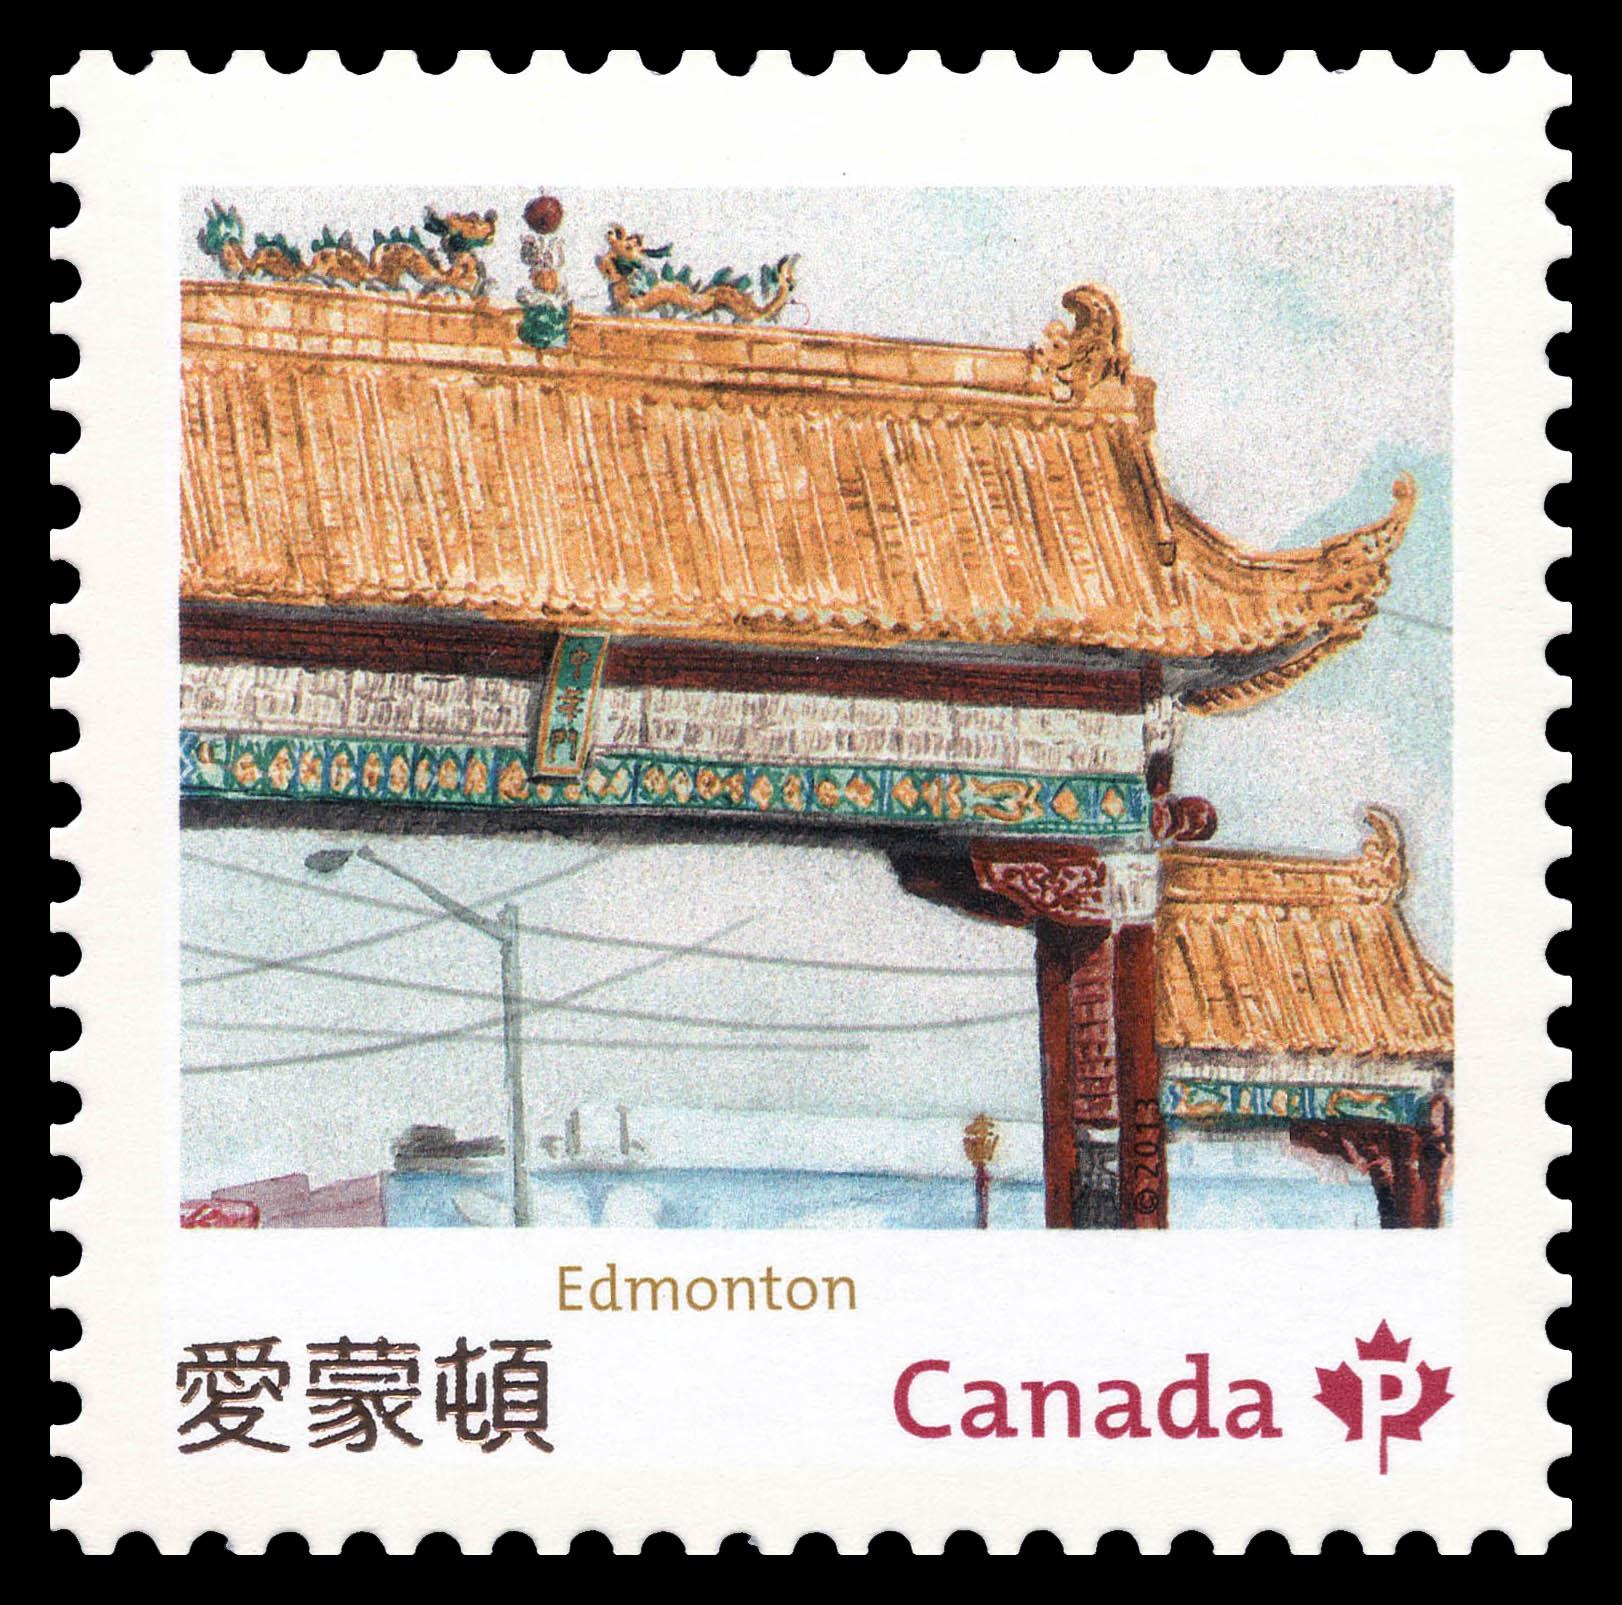 Edmonton Chinatown Gate Canada Postage Stamp | Chinatown Gates